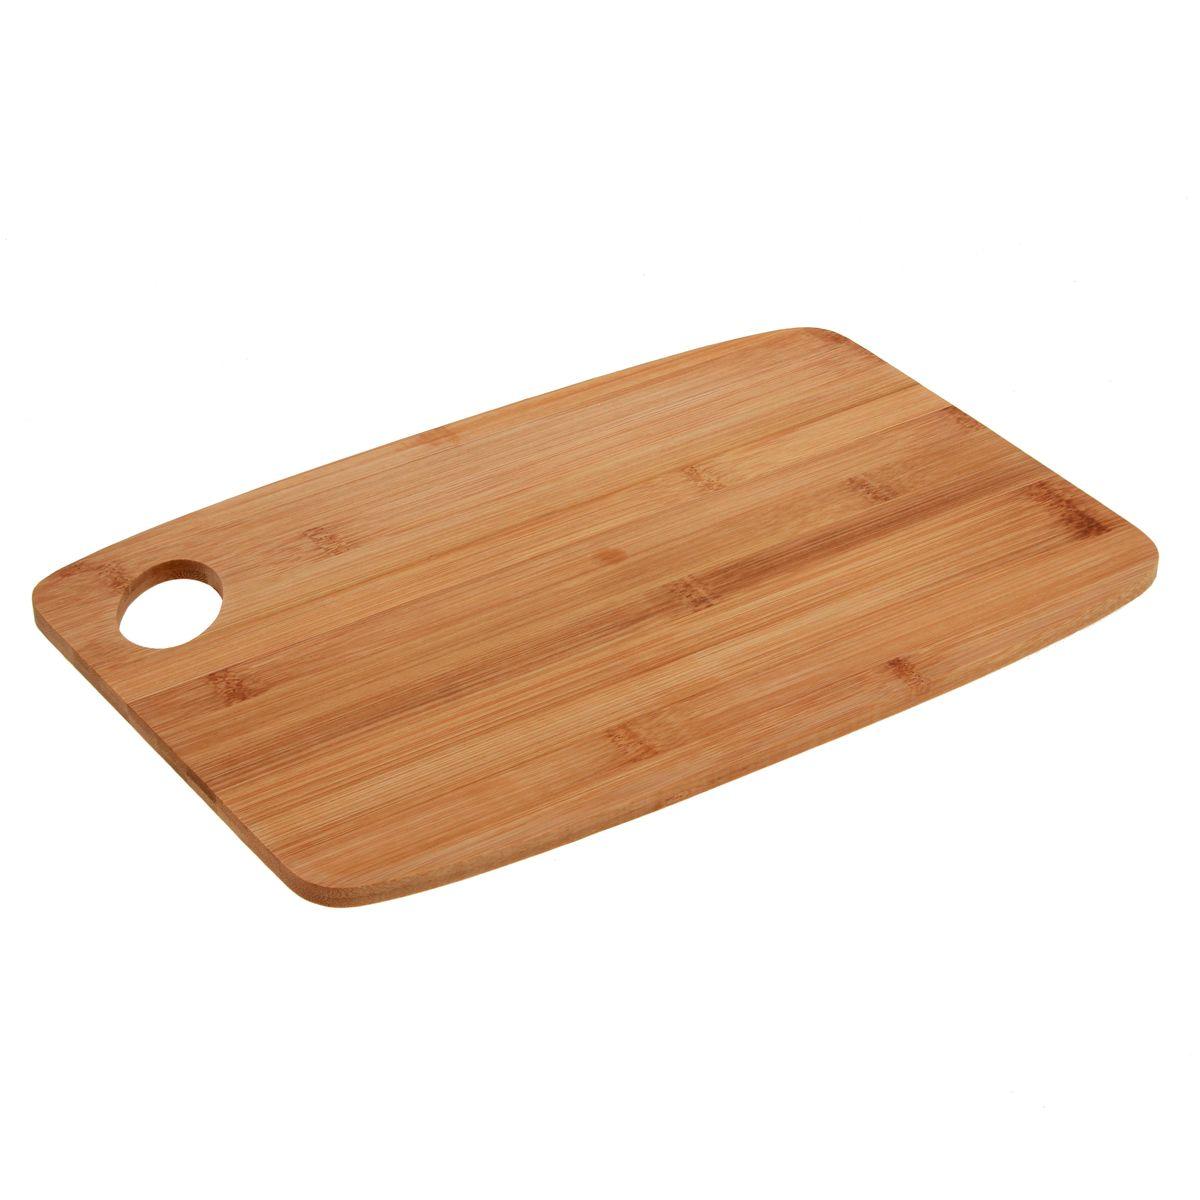 Planche bambou avec manche 34 x 23 x 1 cm - Zeller